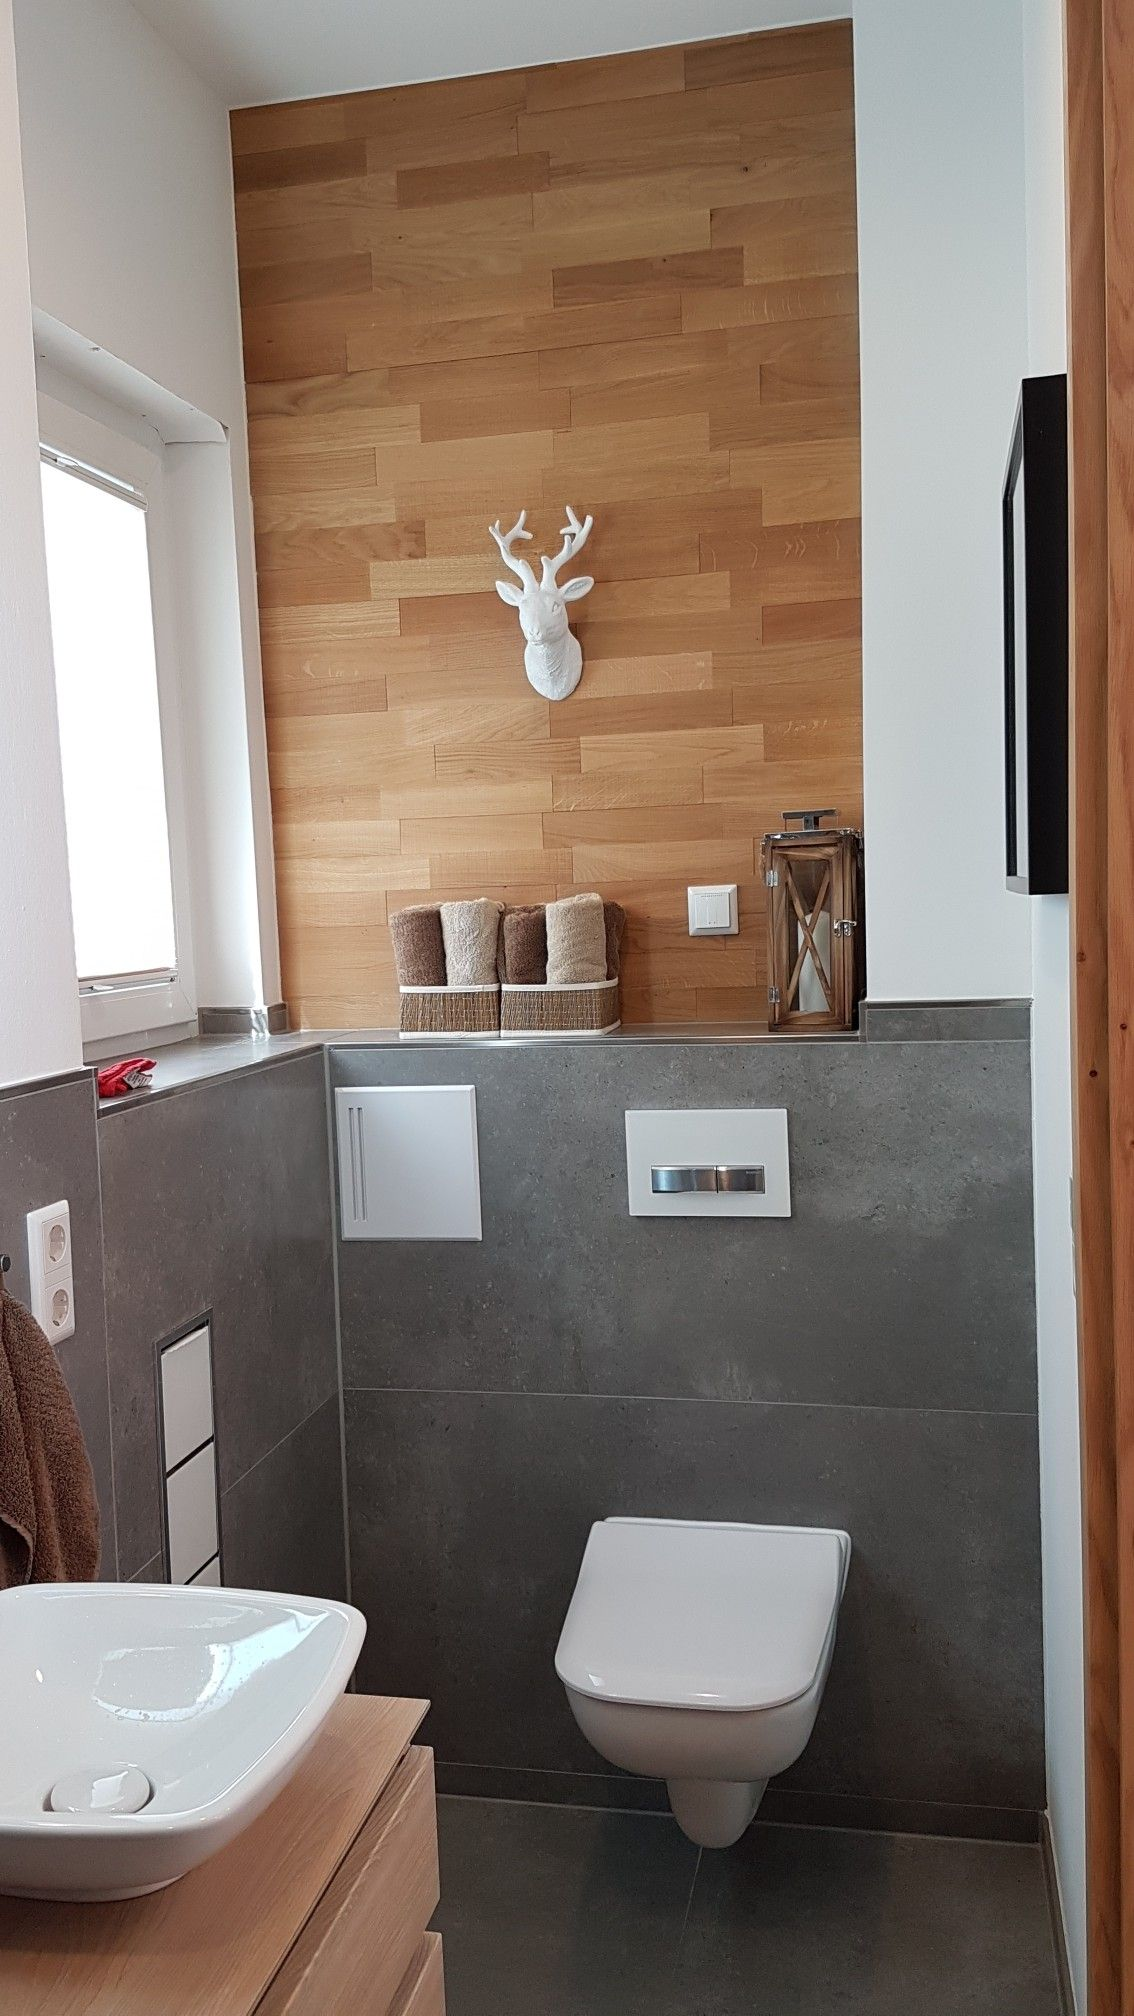 holzvert felung wohnen pinterest. Black Bedroom Furniture Sets. Home Design Ideas